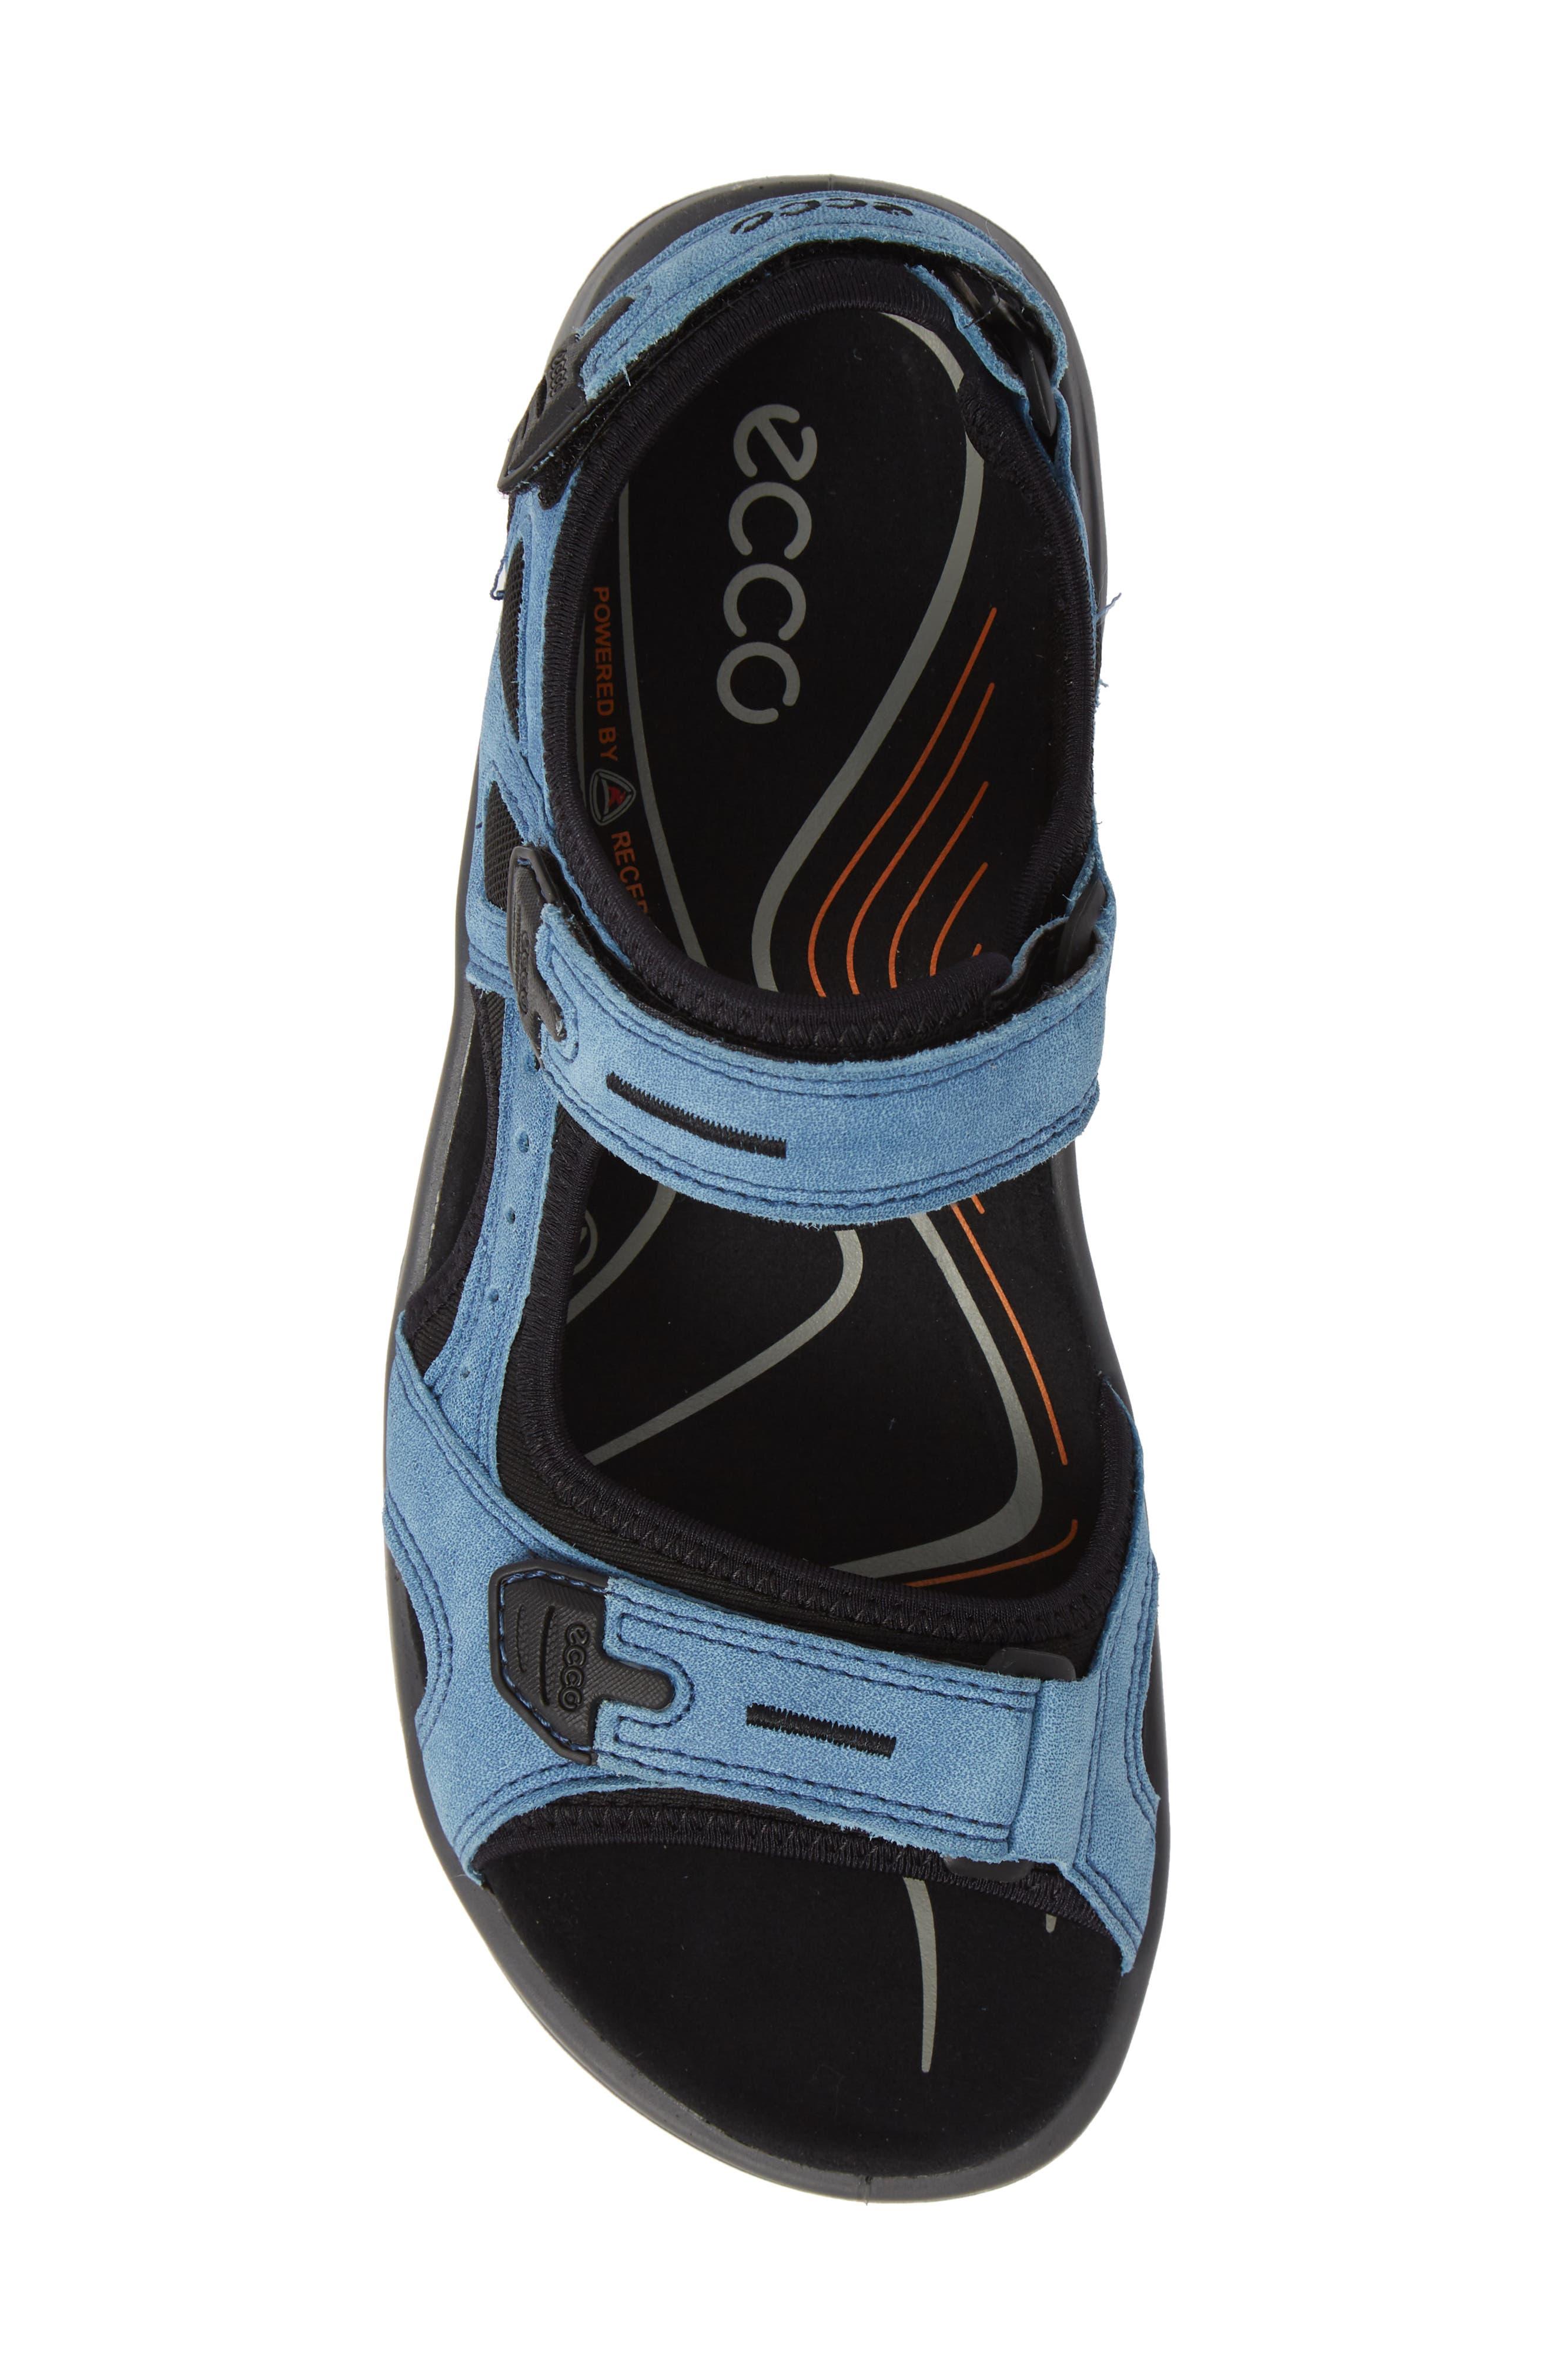 Offroad Sport Sandal,                             Alternate thumbnail 5, color,                             INDIGO LEATHER